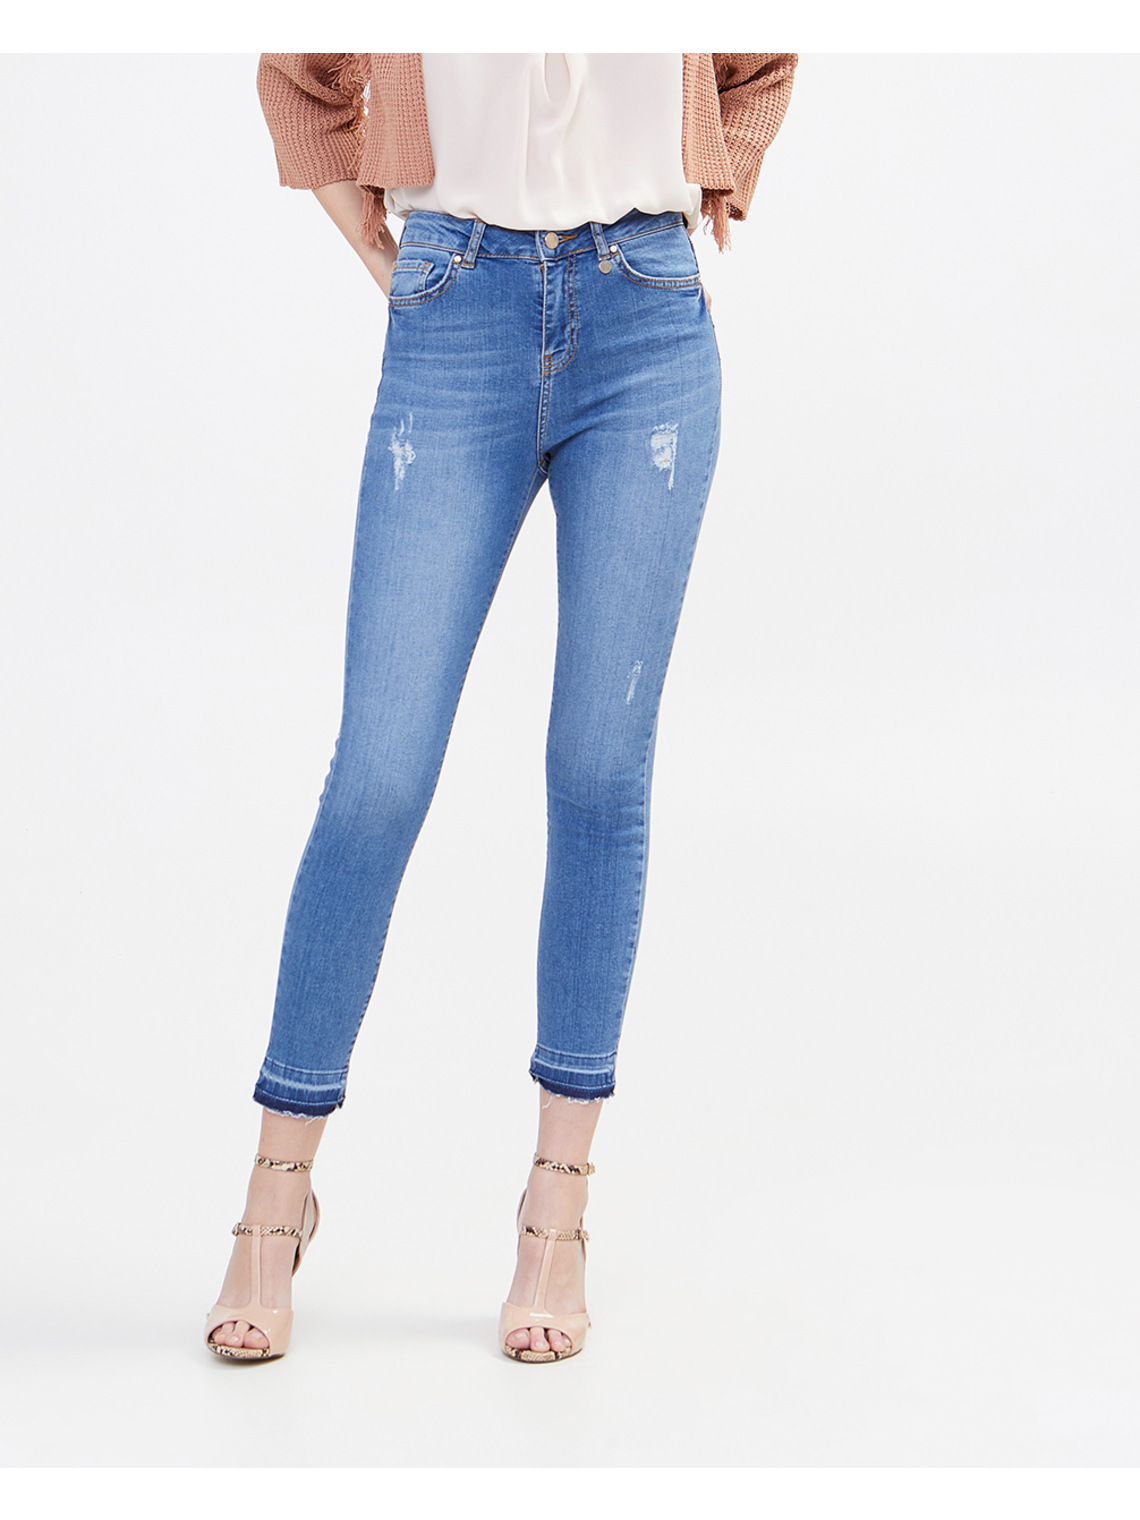 c0df68020d7 Medium wash high-waist skinny jeans - Motivi.com - GB